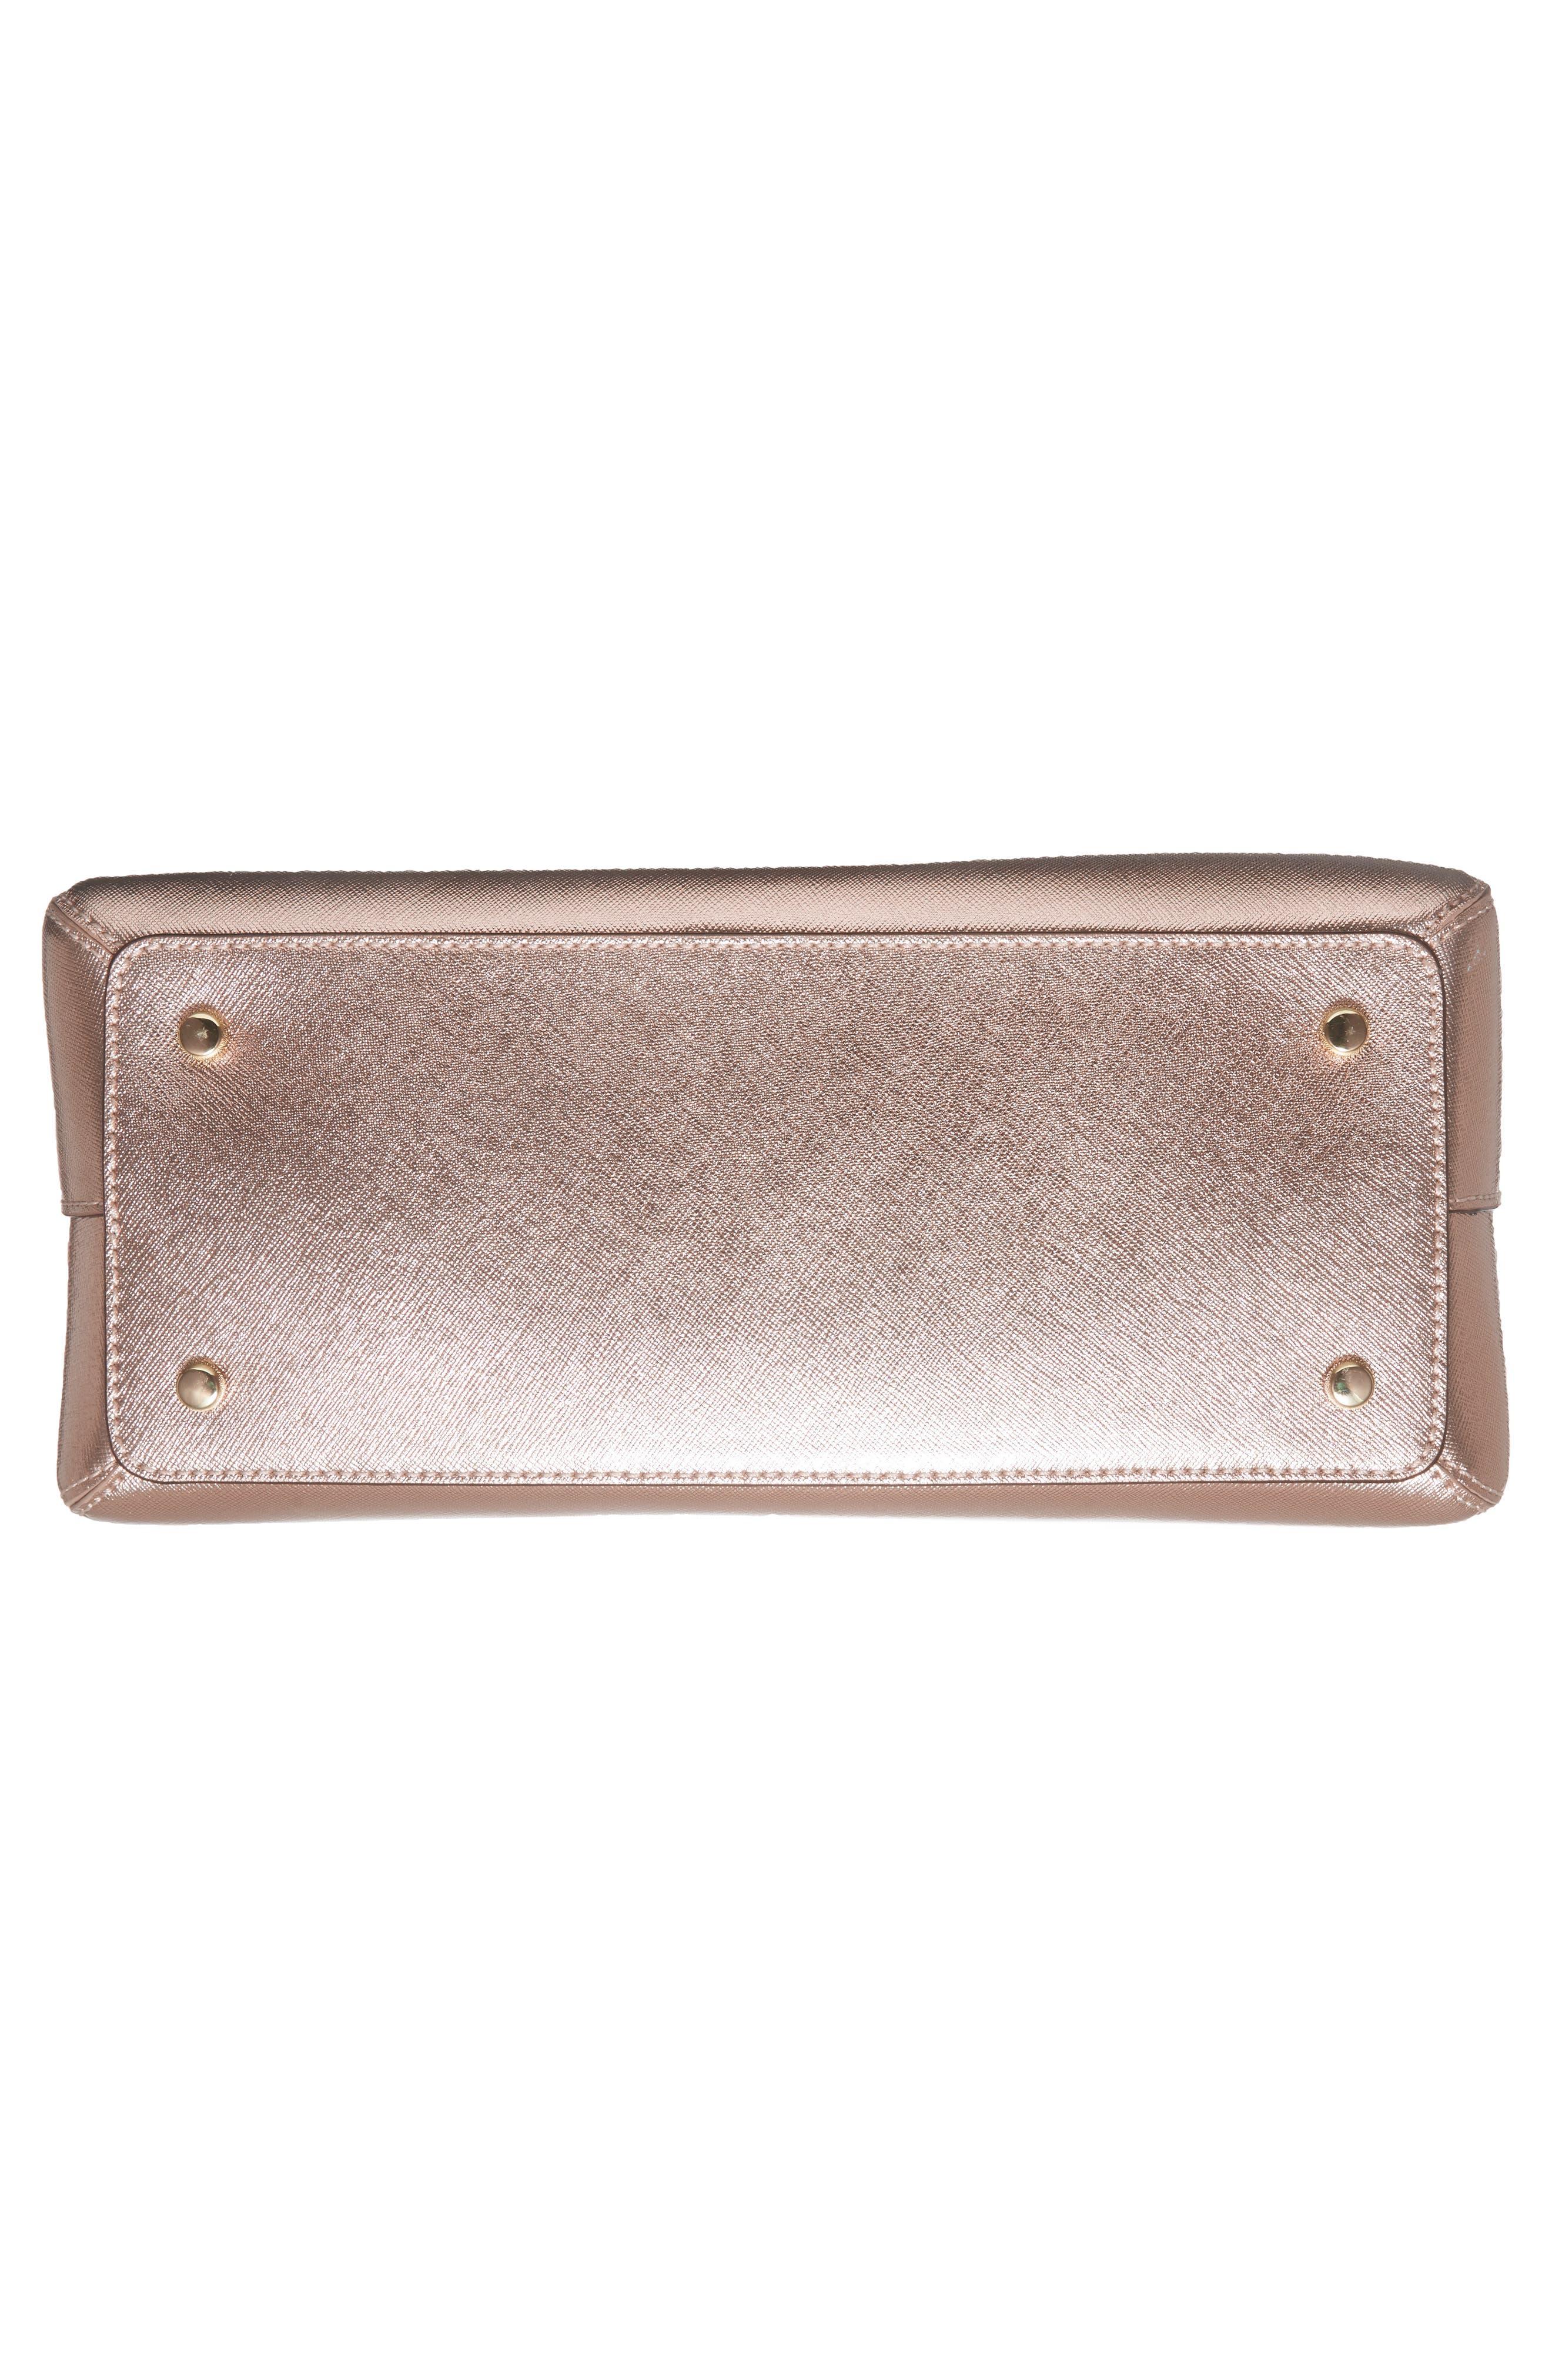 cameron street - lottie leather satchel,                             Alternate thumbnail 6, color,                             650